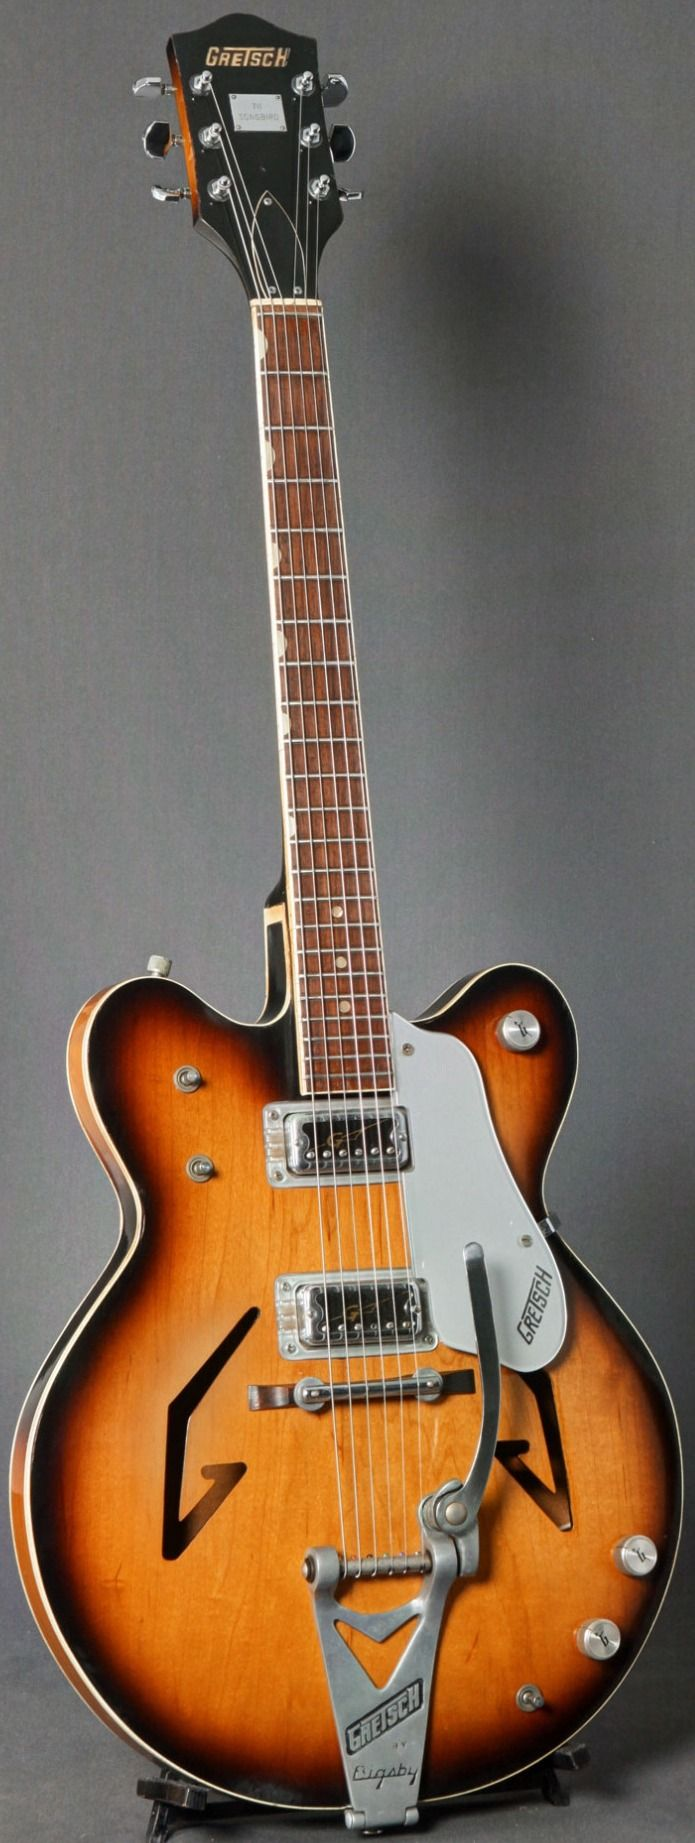 1967 Gretsch Songbird 711 --- https://www.pinterest.com/lardyfatboy/